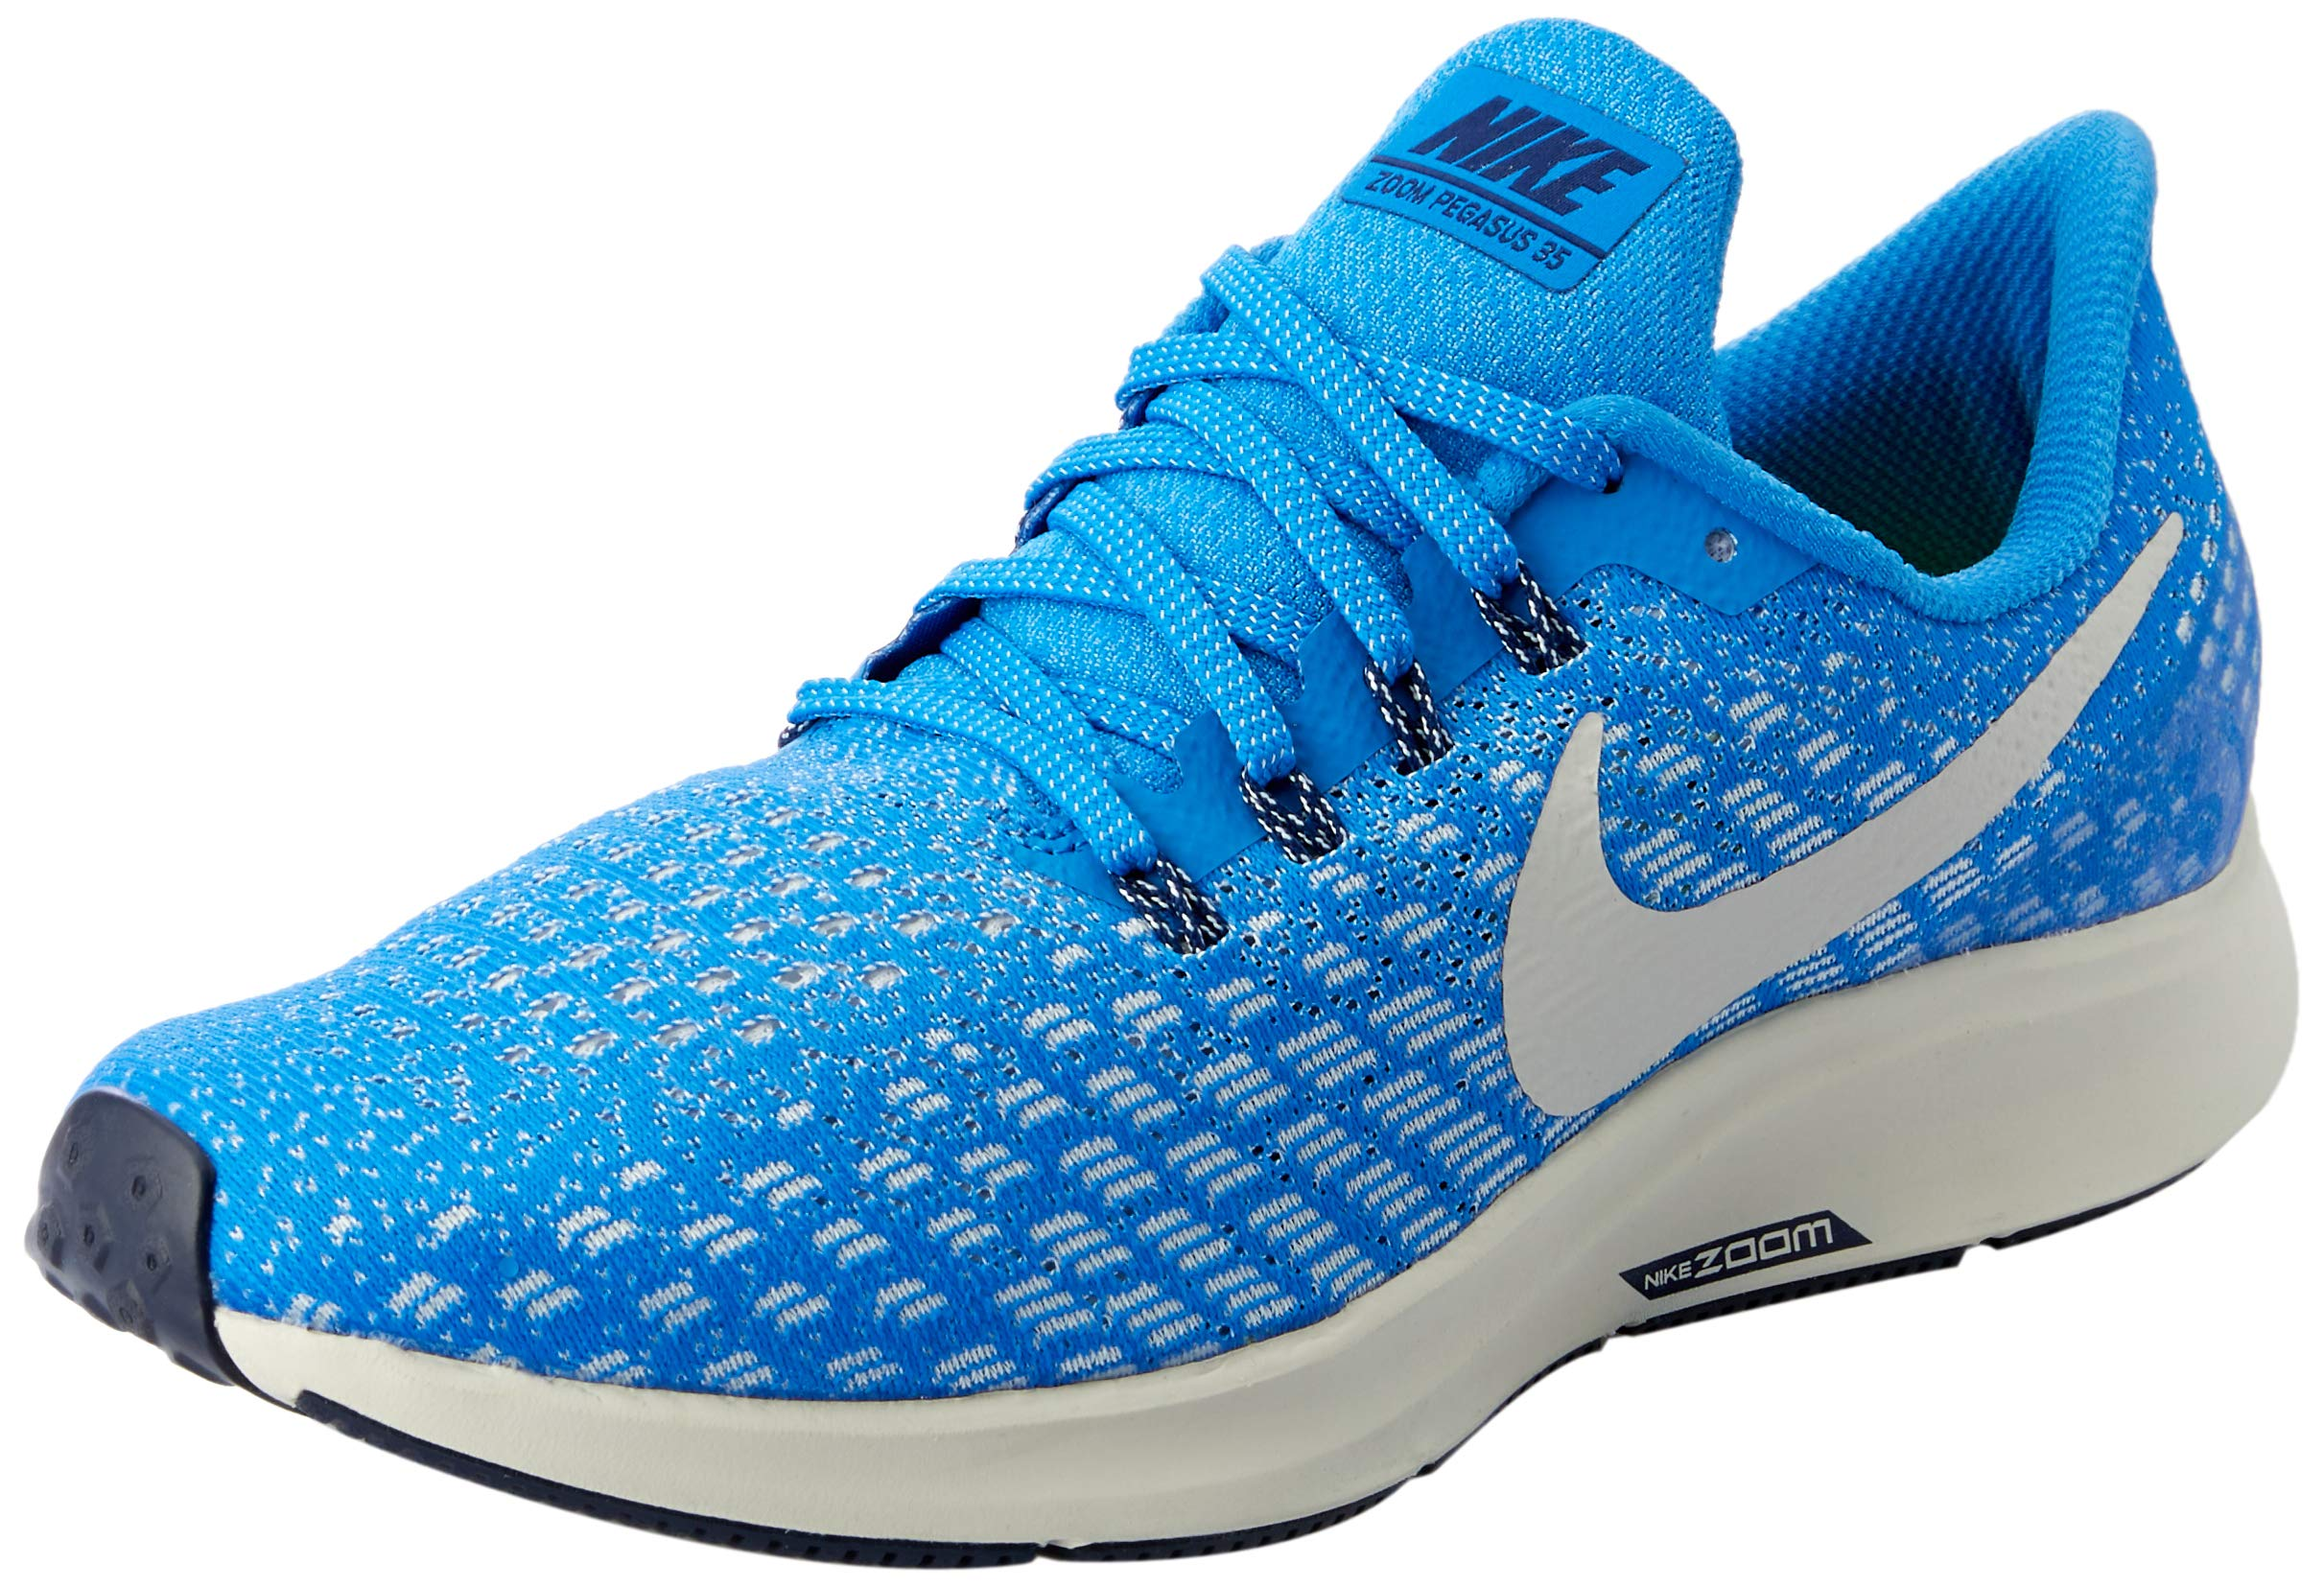 7b90d30560d63 Galleon - Nike Men s Air Zoom Pegasus 35 Running Shoes (11.5 D US ...